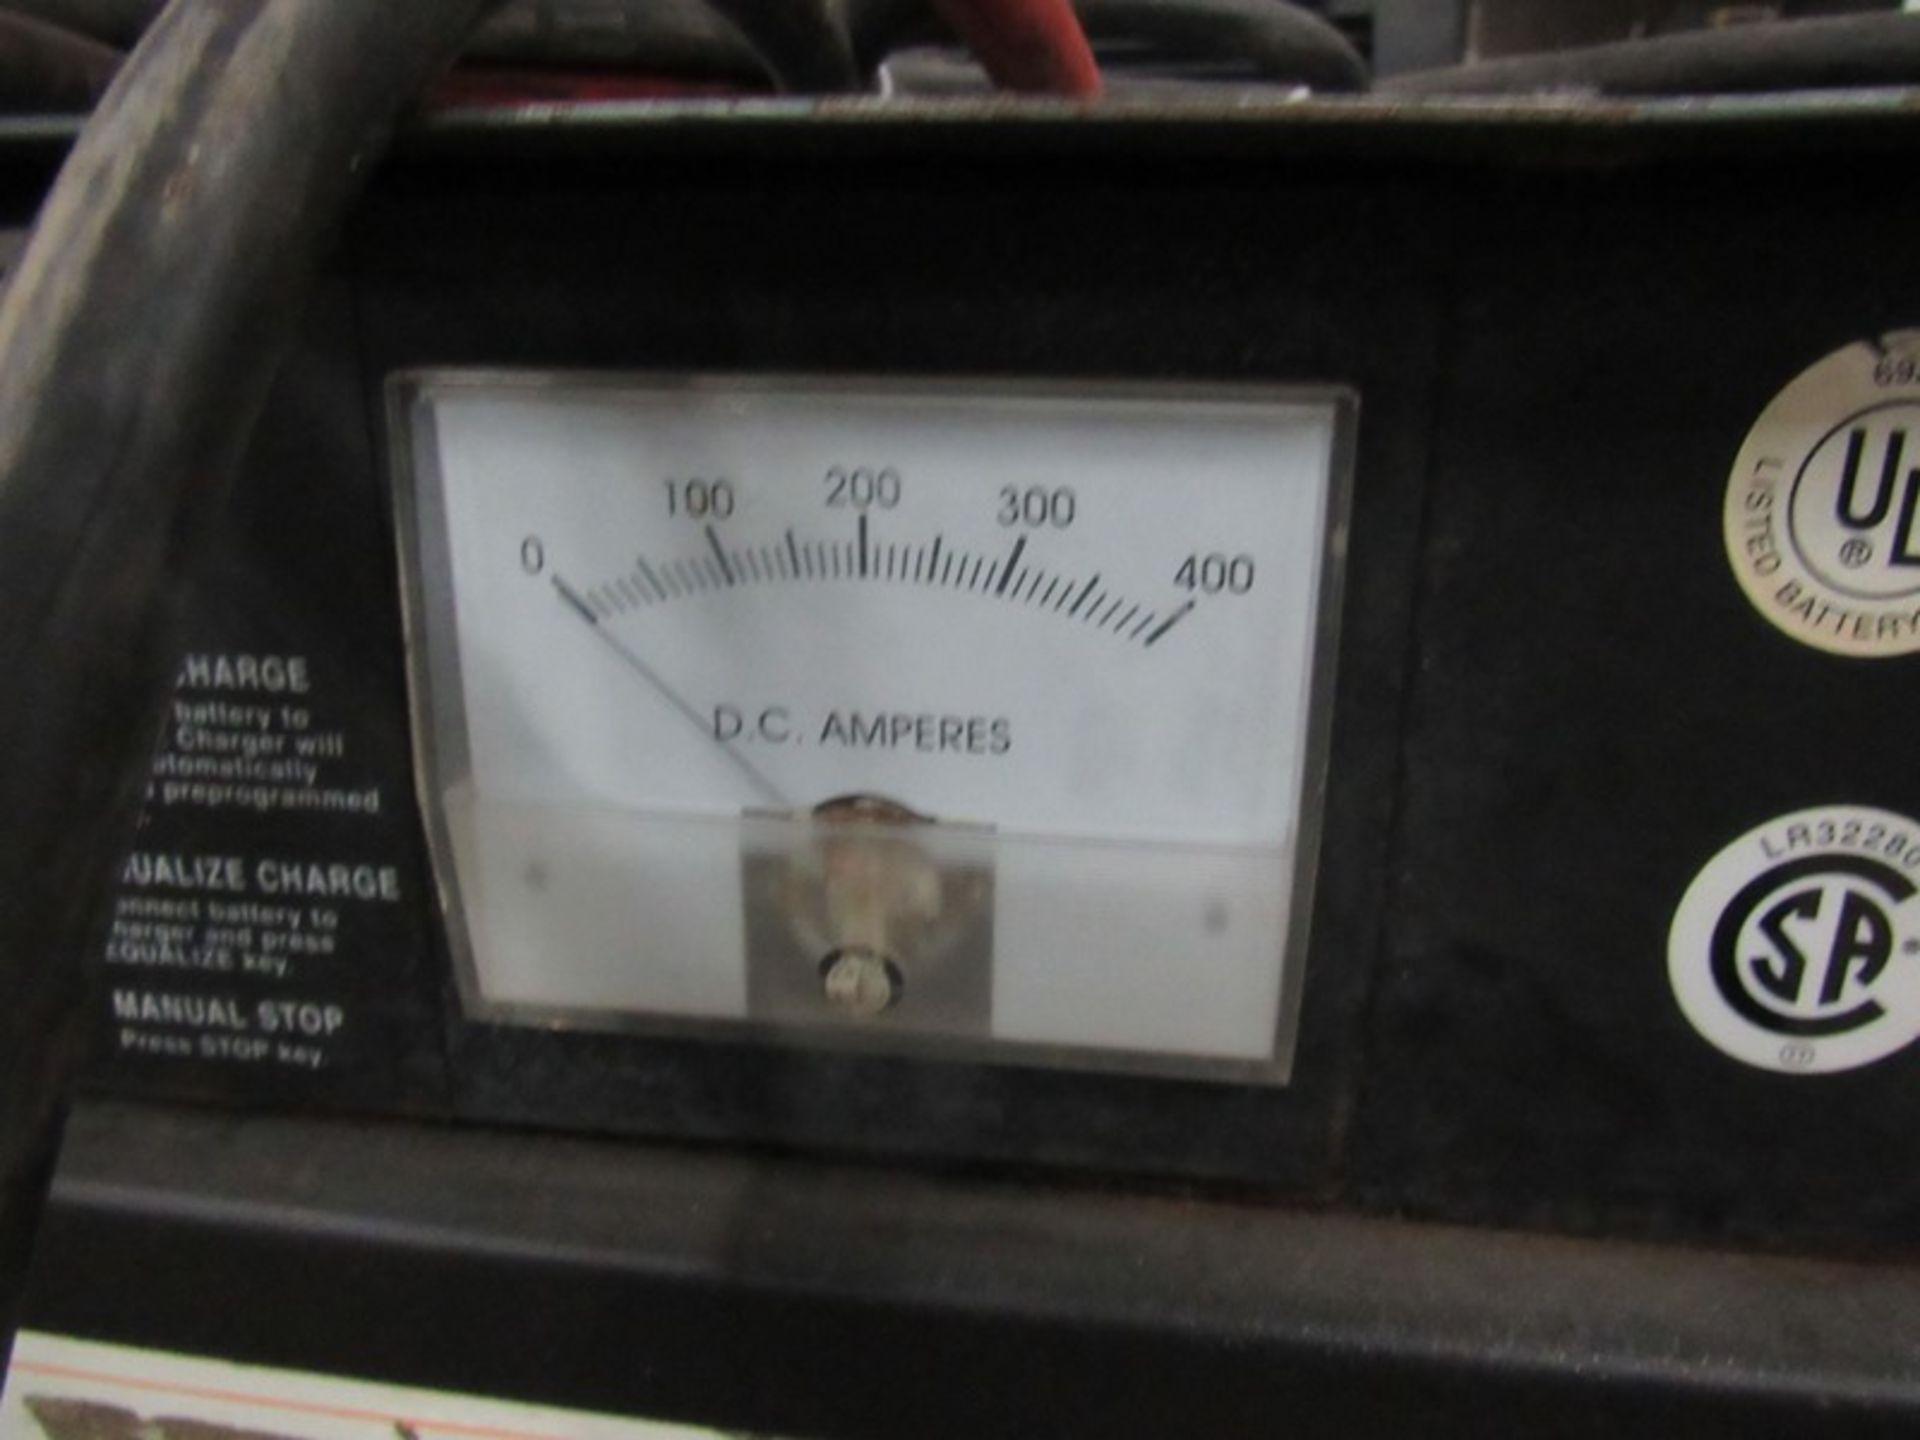 Lot 96 - Deka Mdl. 18C3-1050 Battery Charger, Type LA, Ser. #393DEK0708, 18 cells, 36 volts, 208/230/460